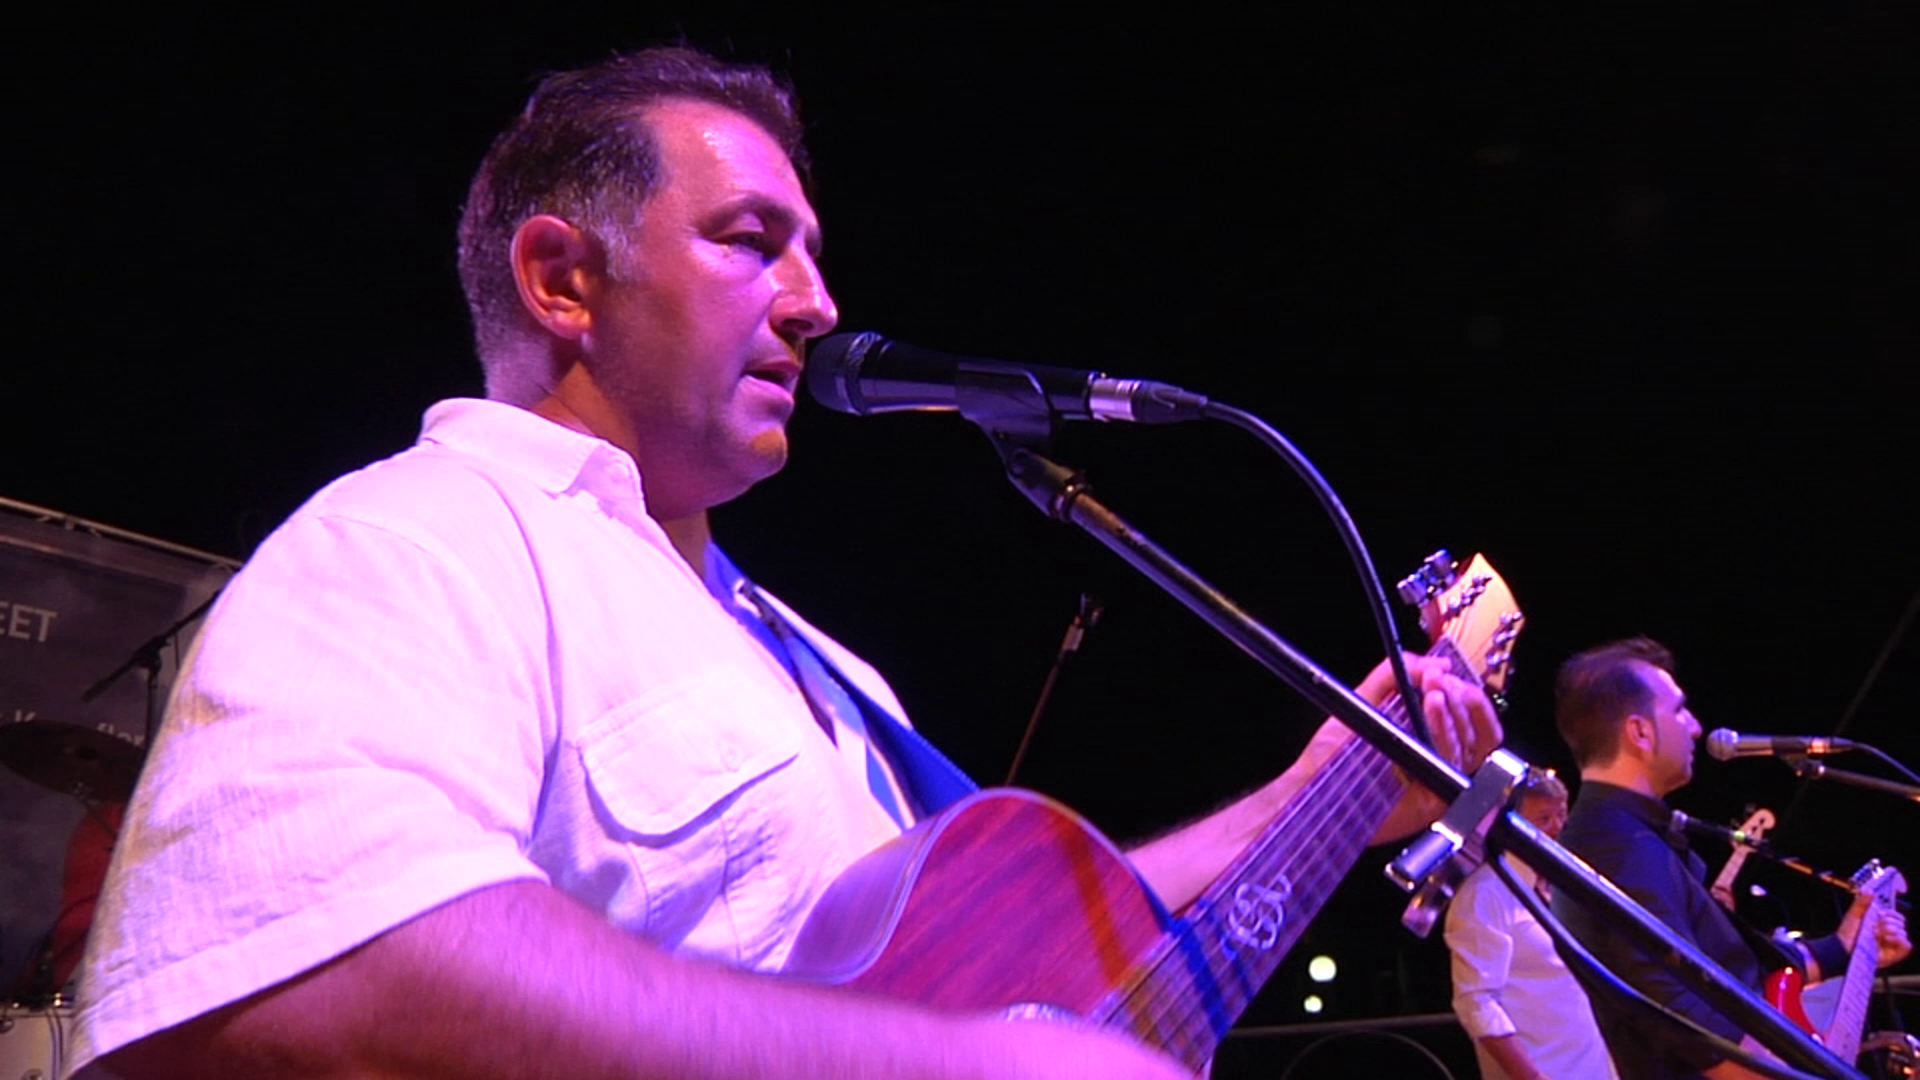 Paolo Donati - Rhythm Guitar Main Street Dire Straits